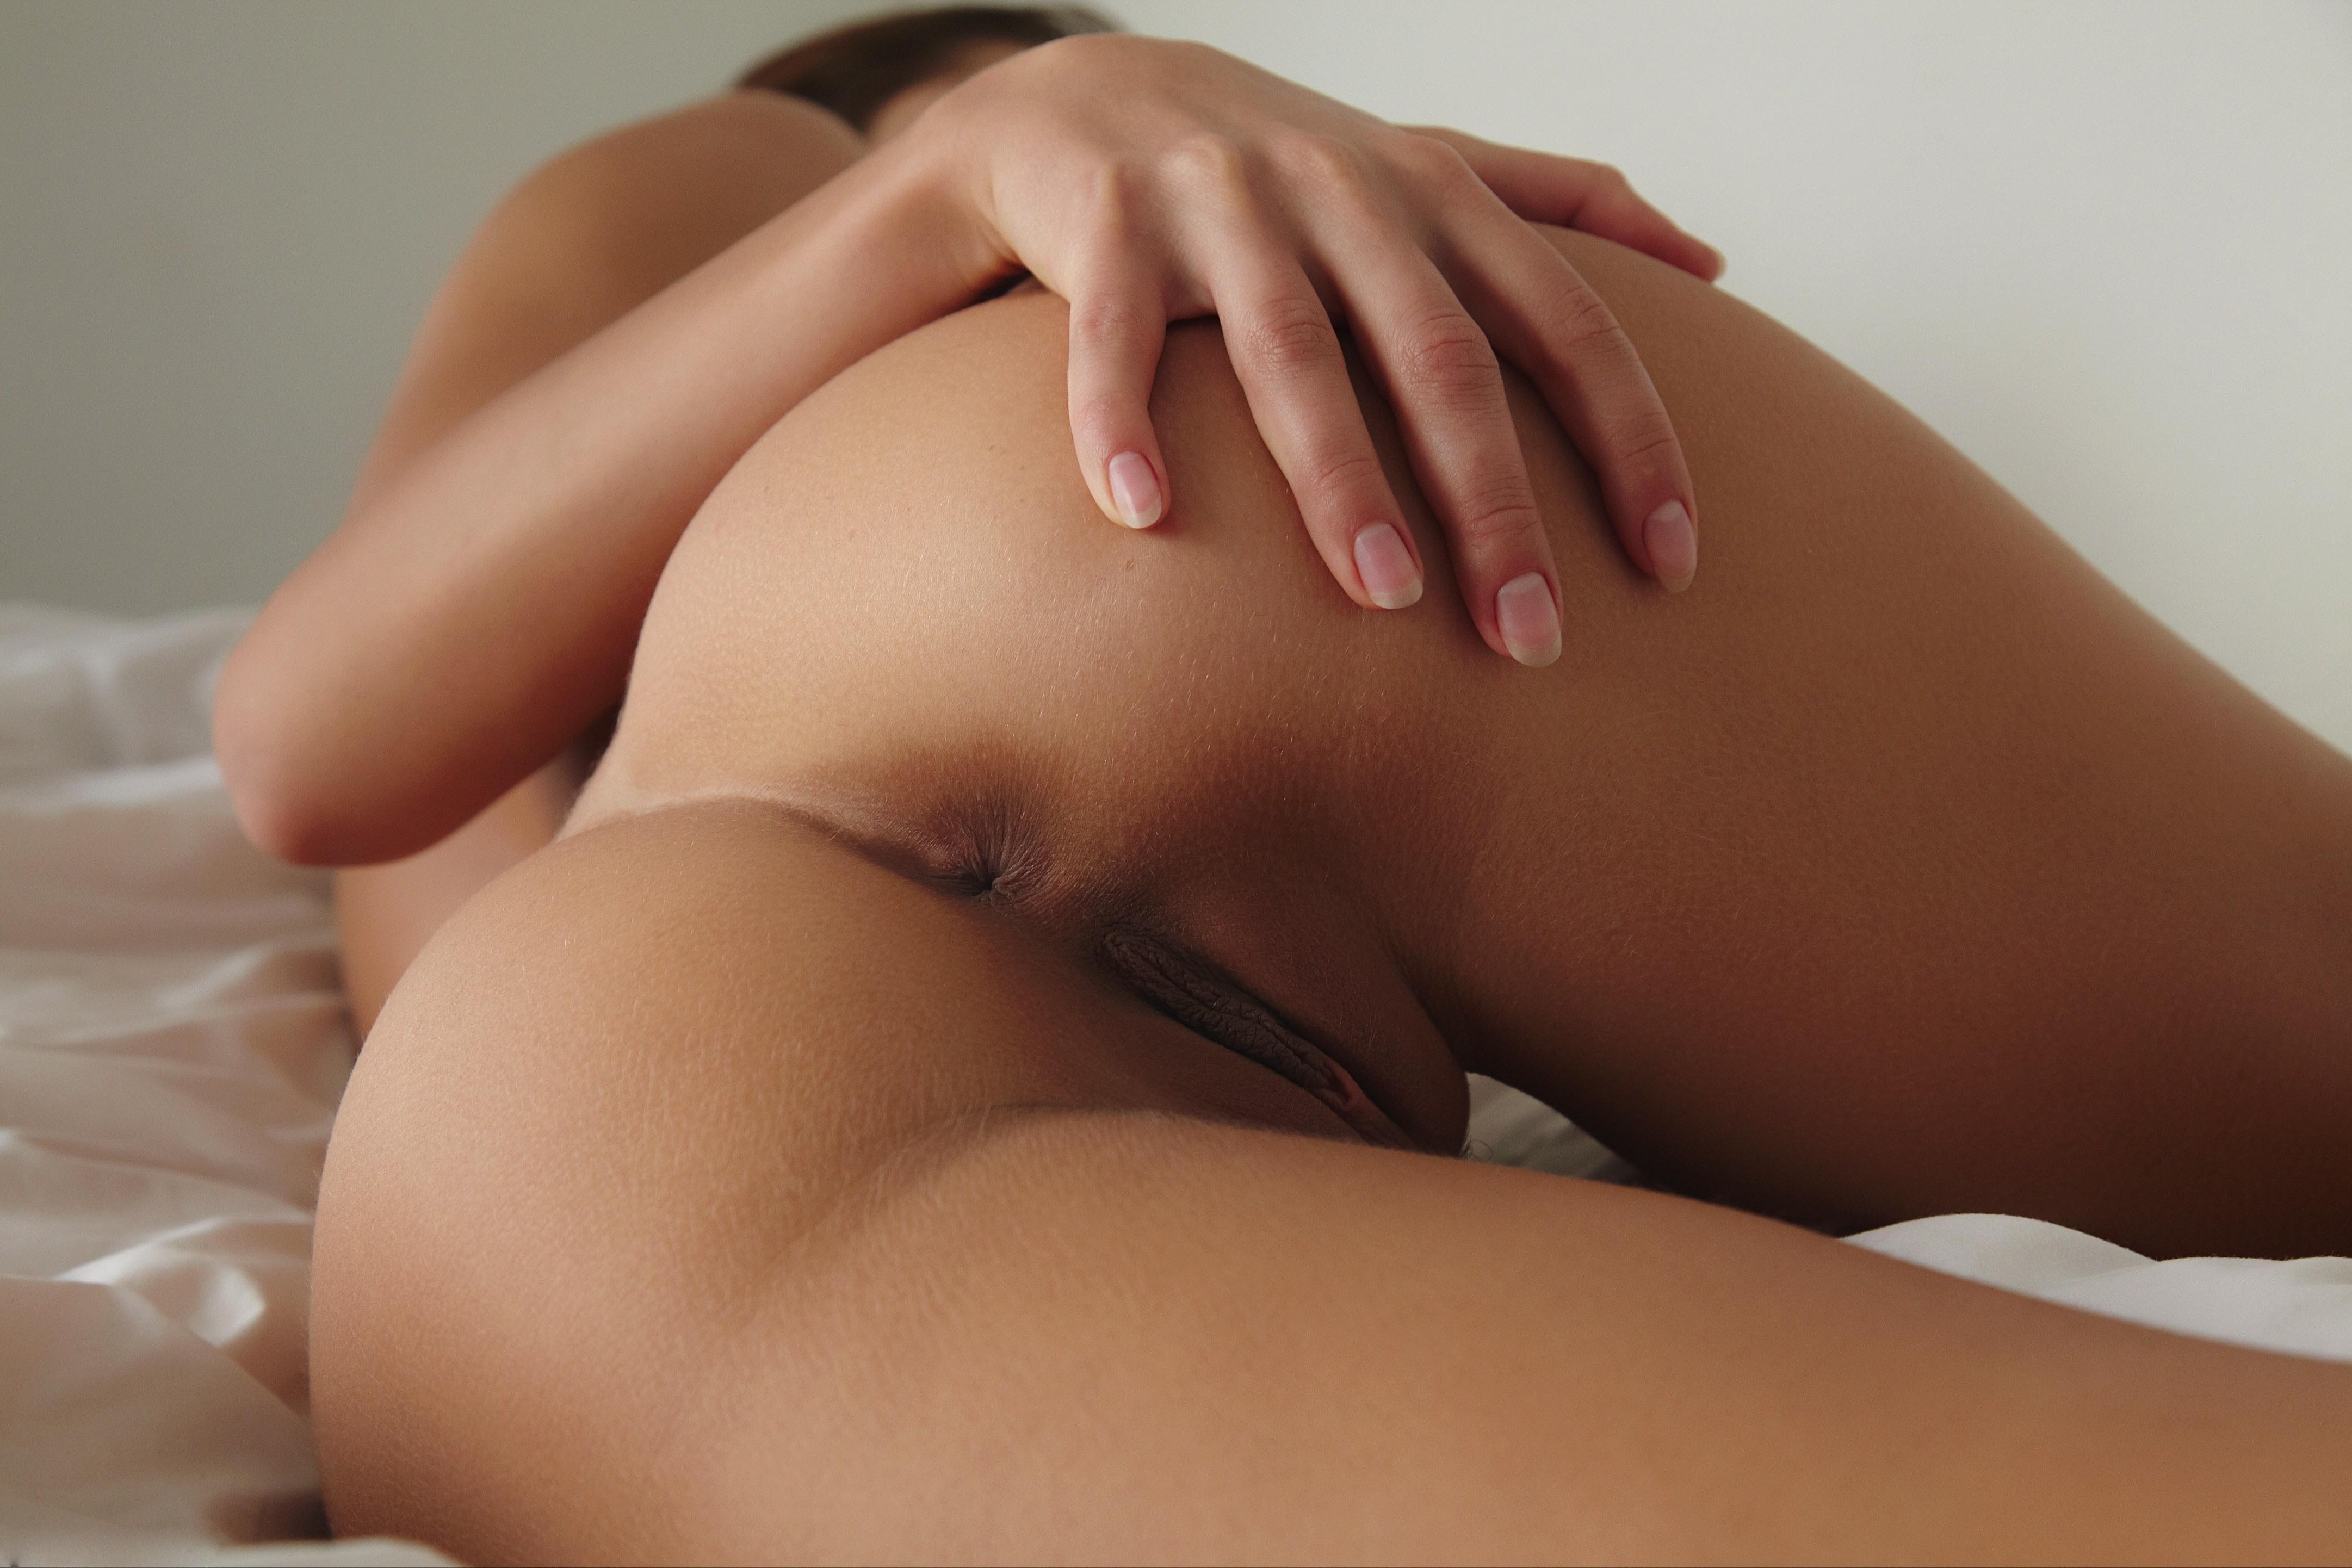 фото девушки в трусиках попки онлайн ласкает себя